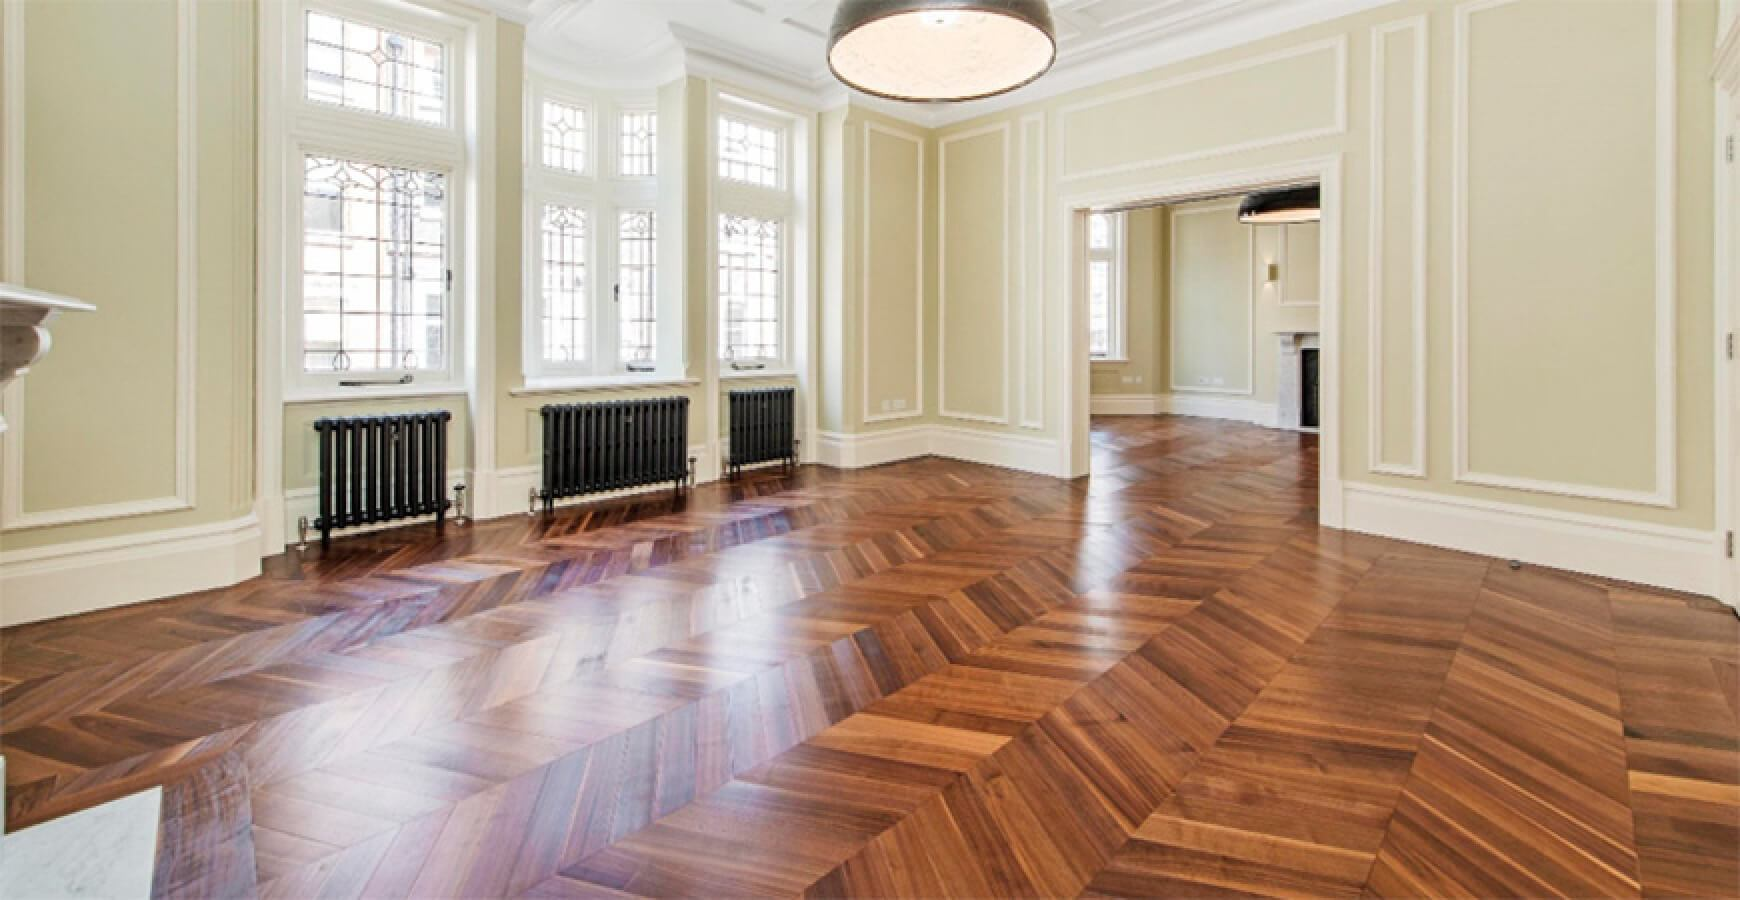 Herringbone & Chevron Parquet Engineered Wood Floors